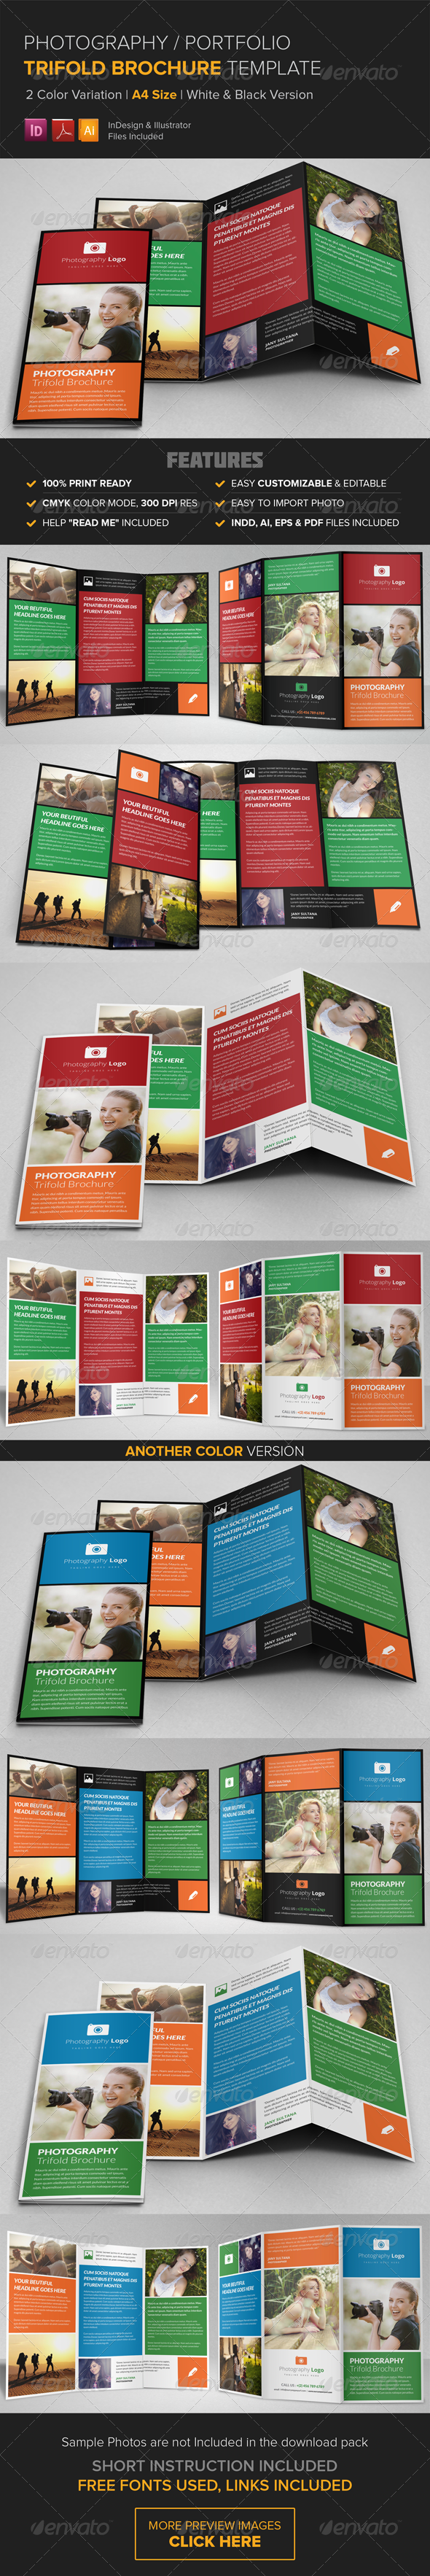 GraphicRiver Photography Portfolio Trifold Brochure Template 8597068